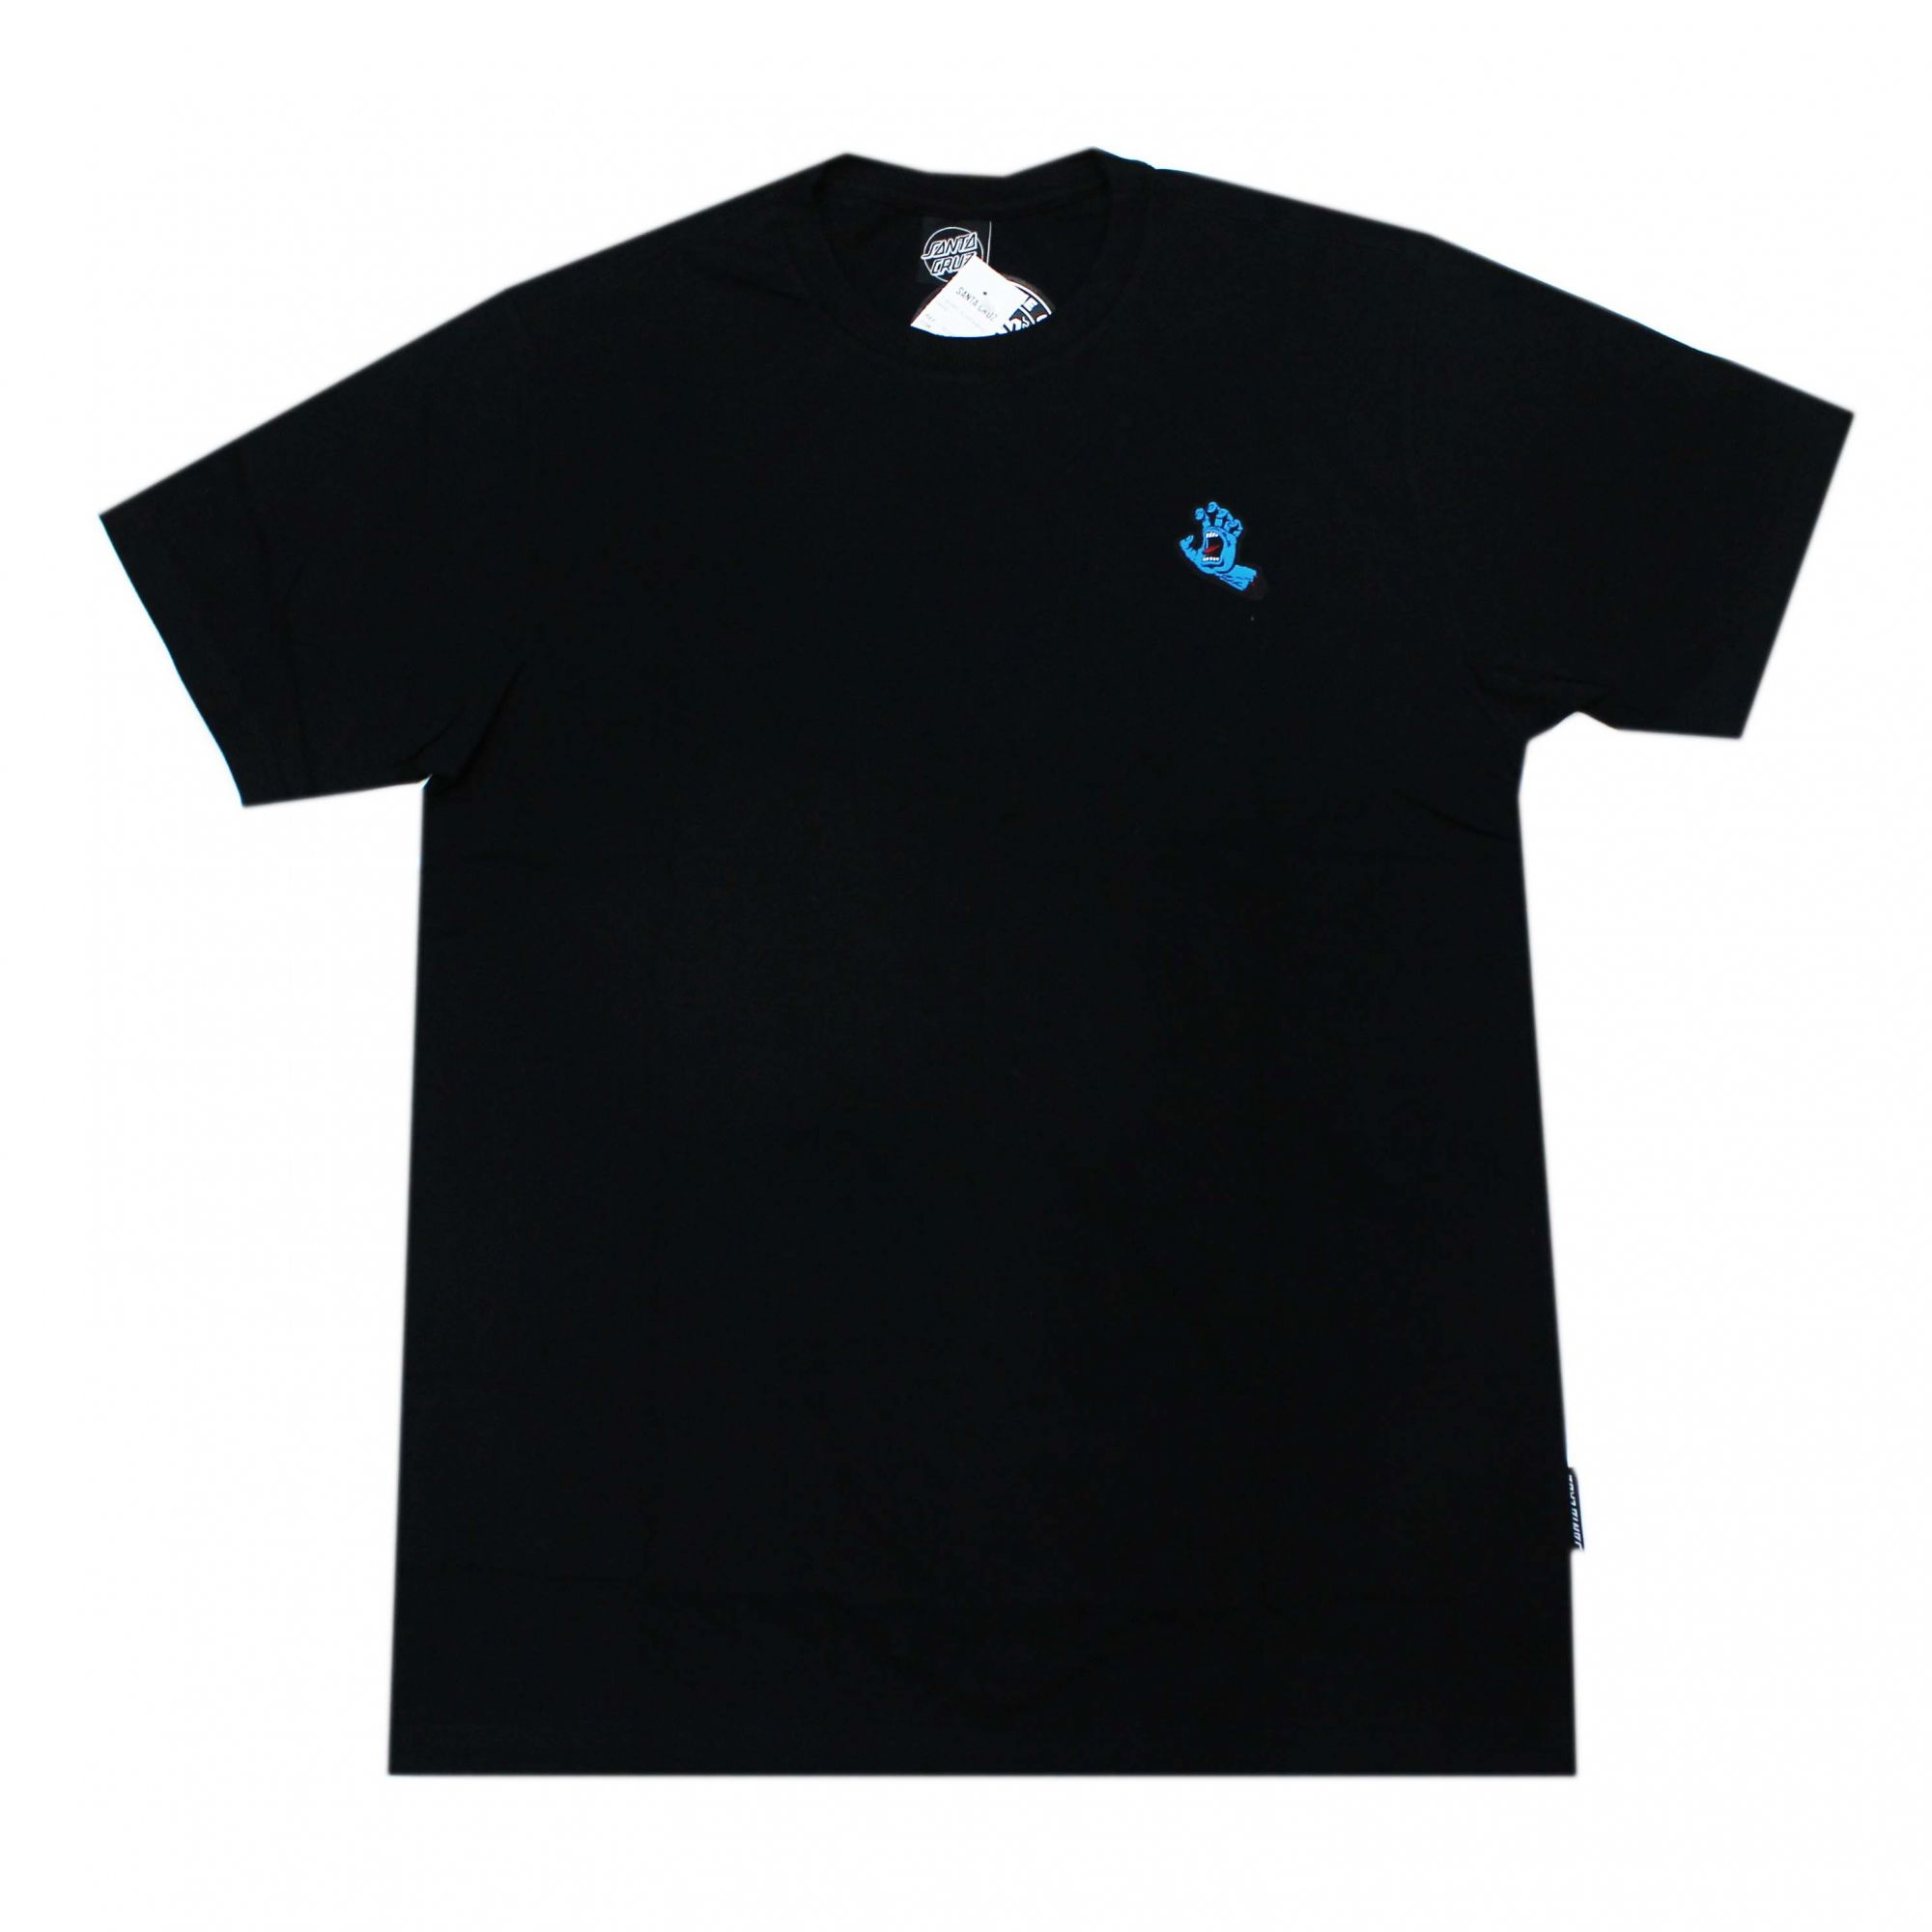 Camiseta Santa Cruz Mini Patch Screaming Hand Preto